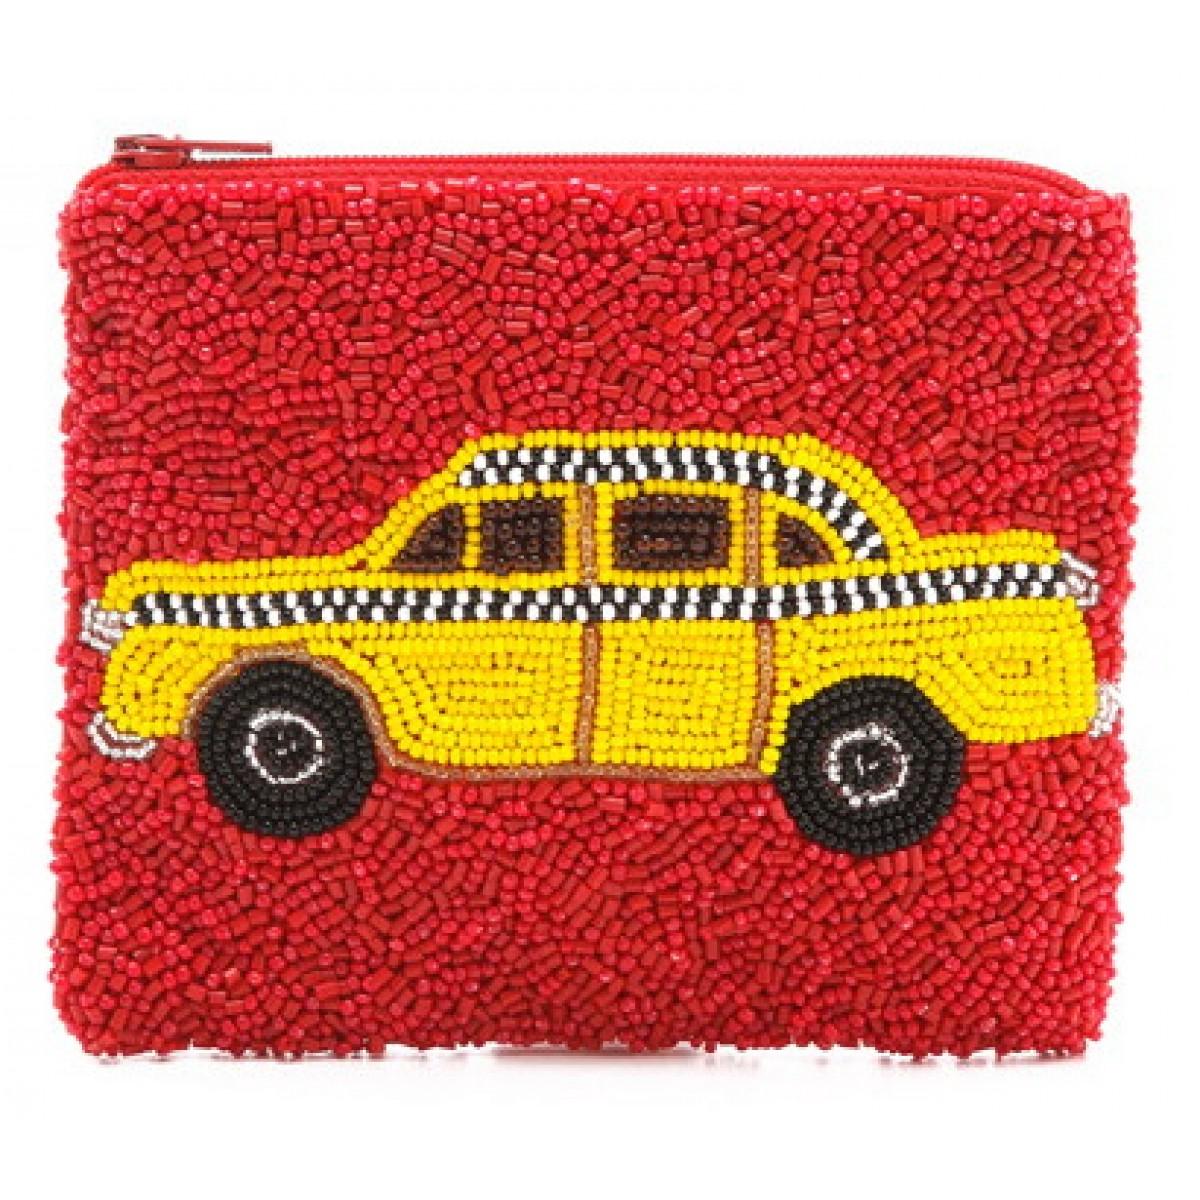 New York Taxi Yellow Cab Bag